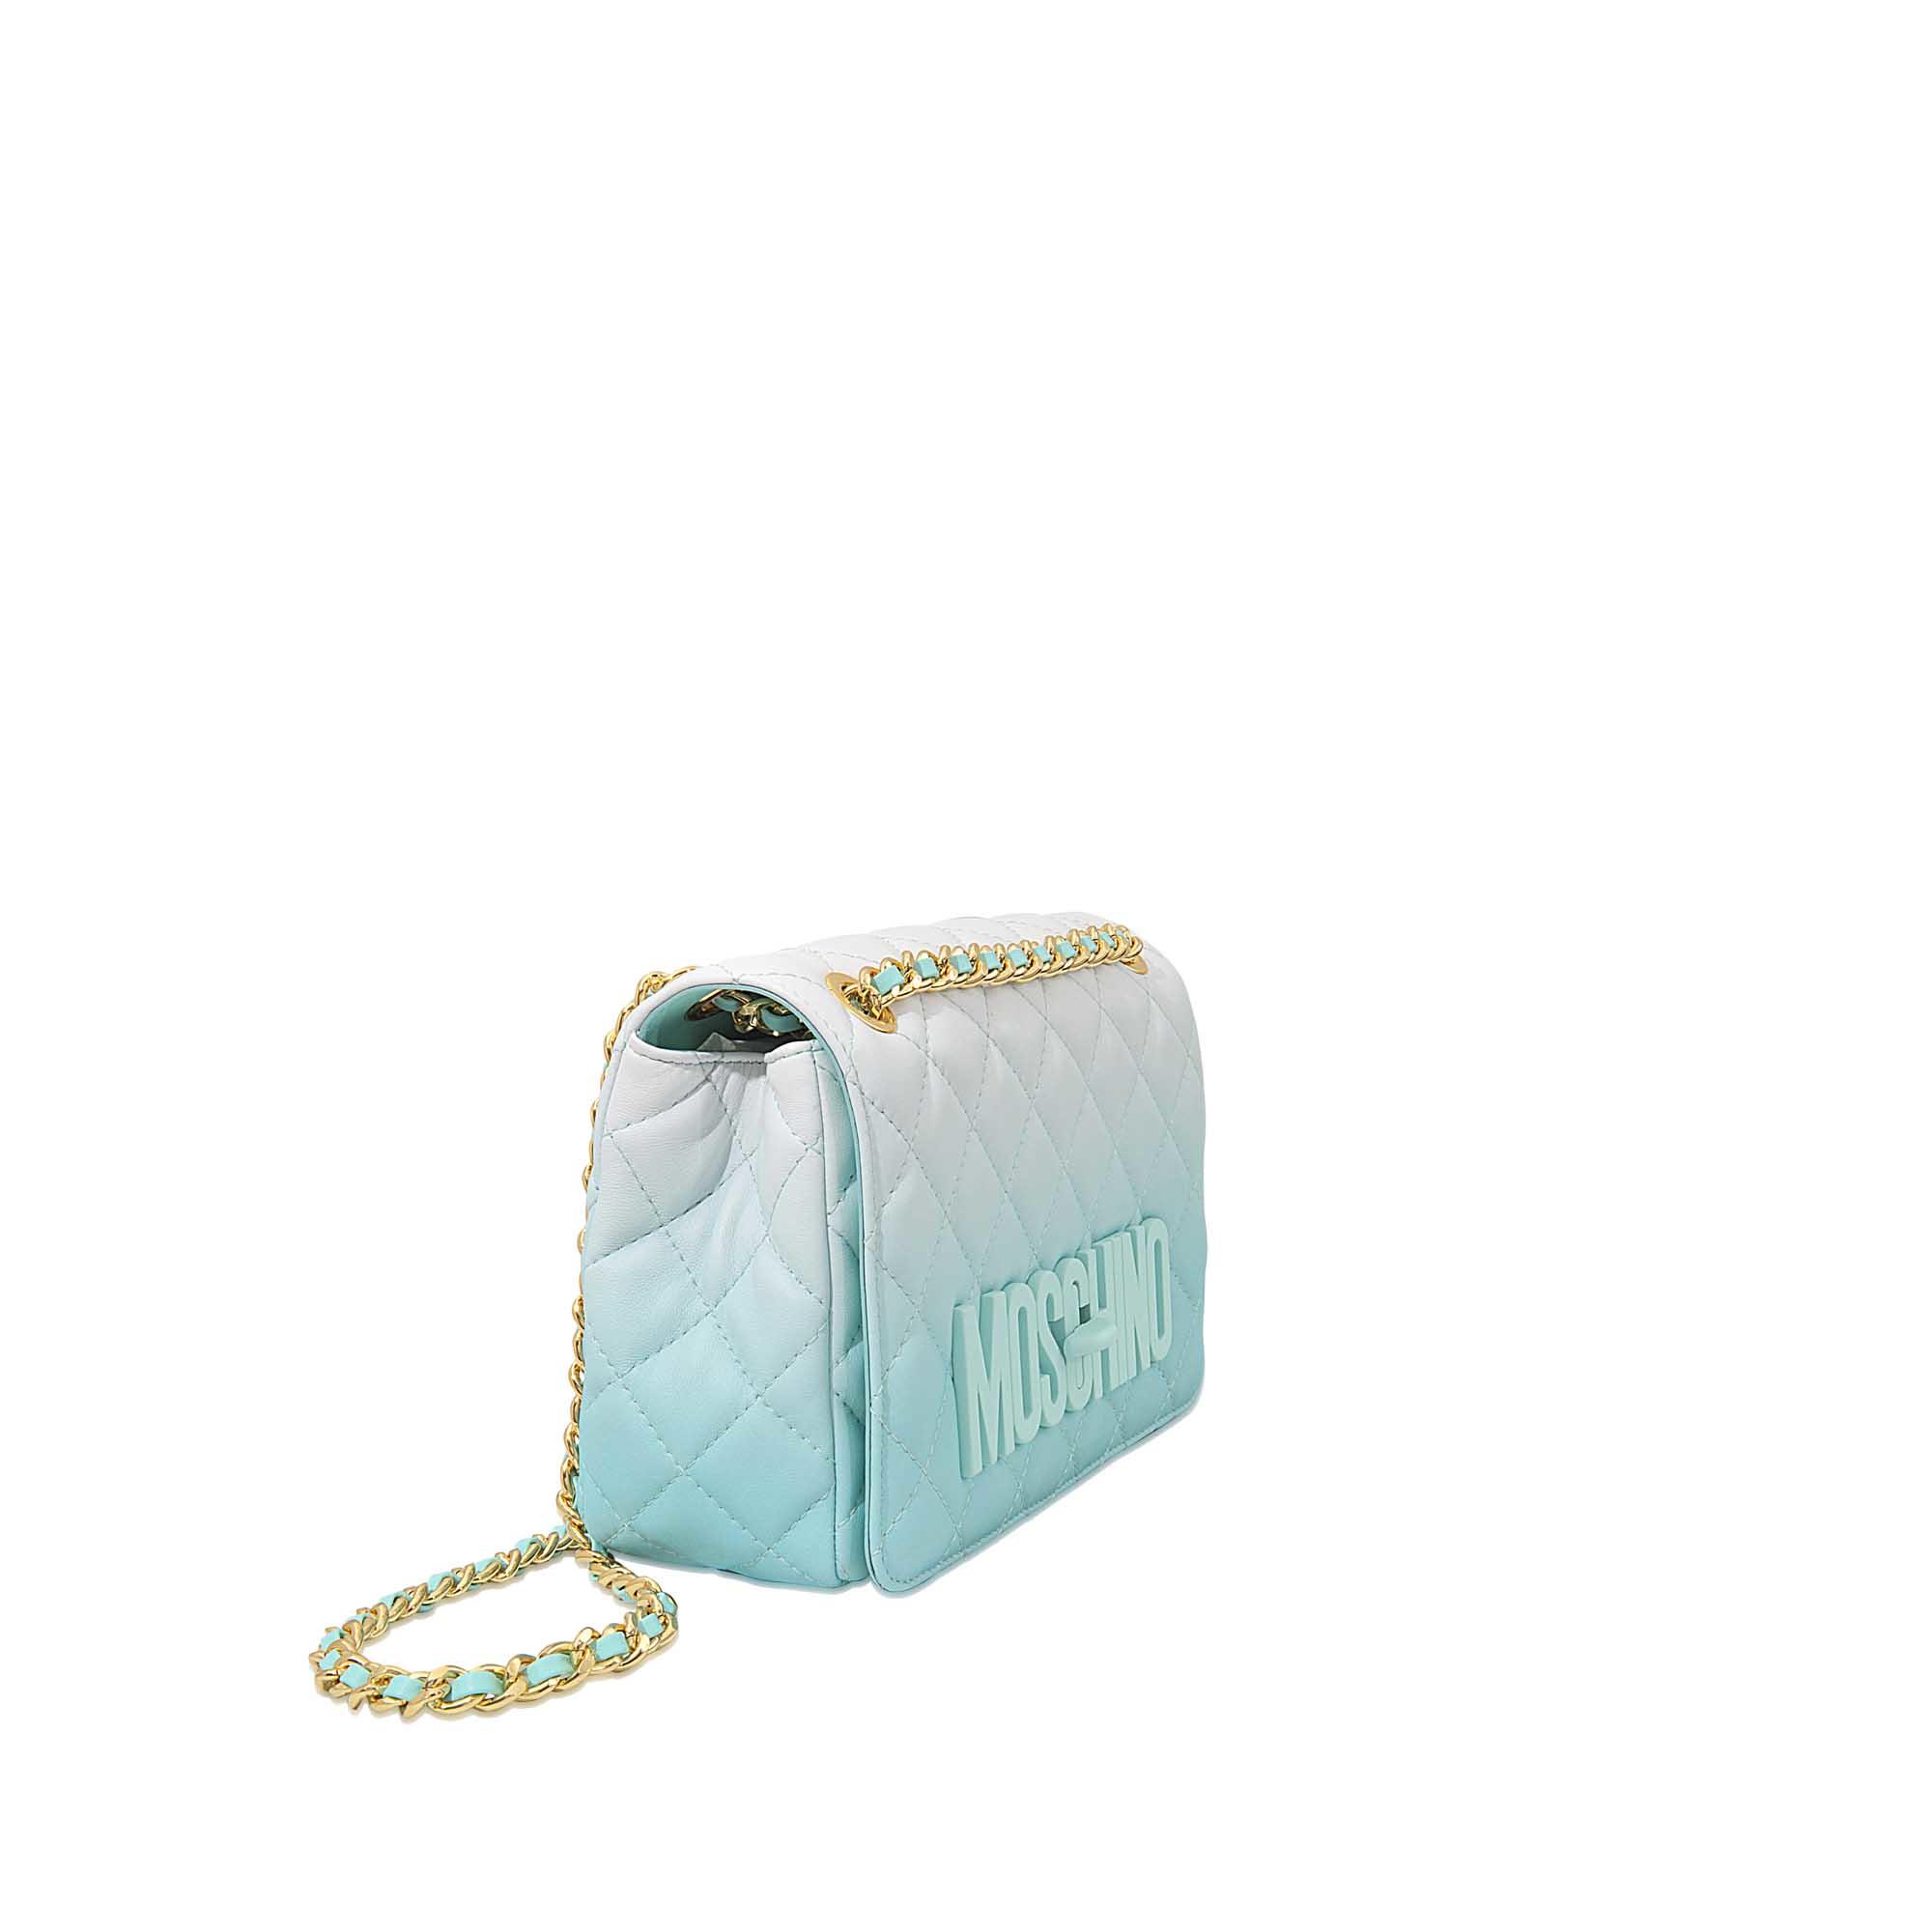 4c1940e374 Moschino Dégradé Medium Quilted Flap Bag in Blue - Lyst